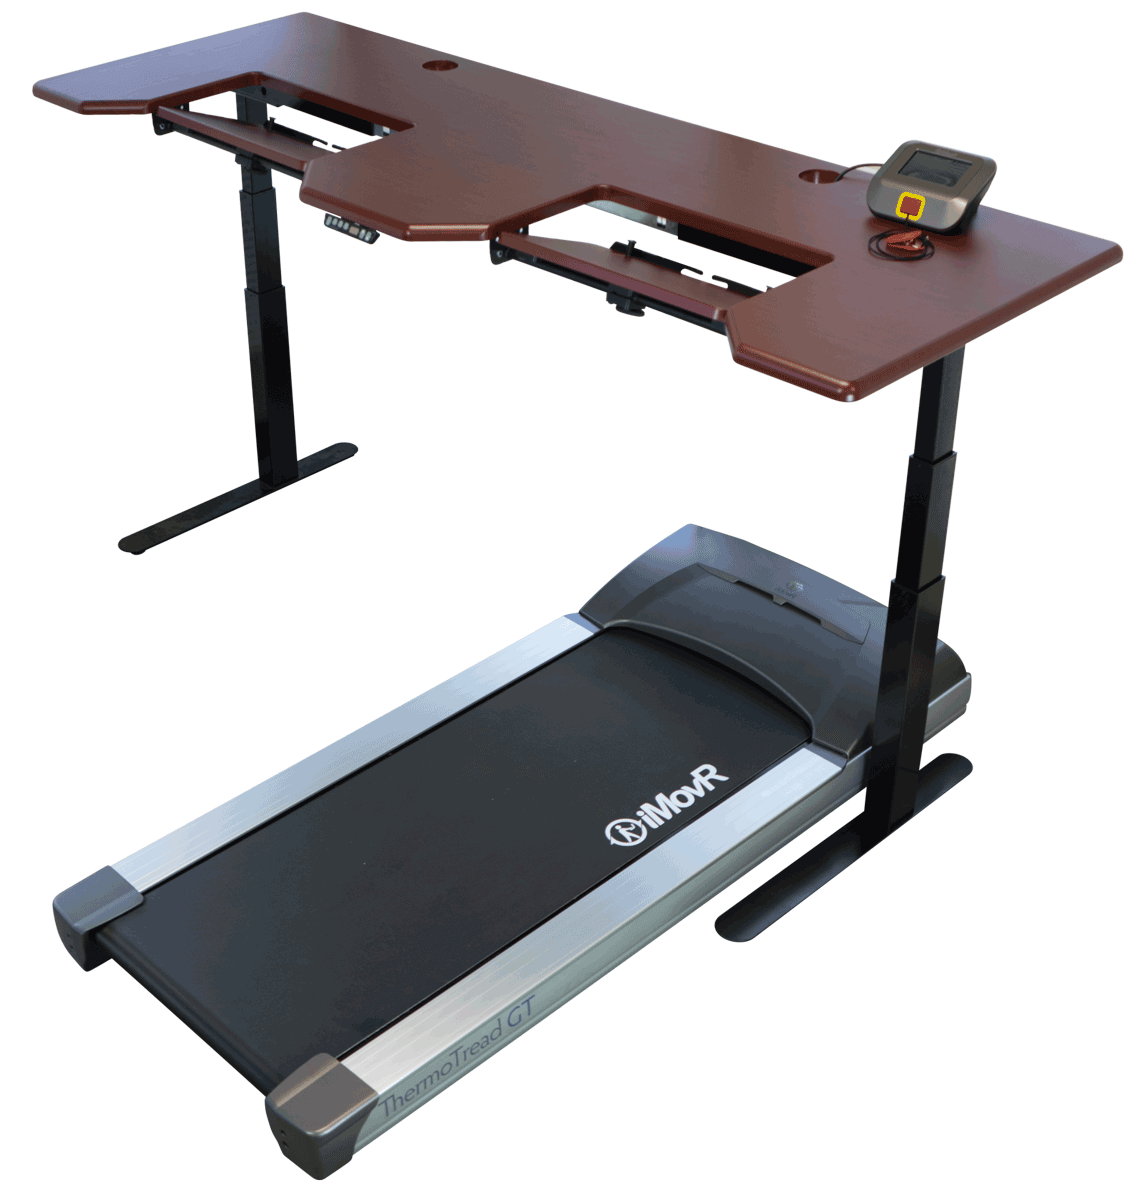 imovr stool treadmill category office on under desk articles tempo reviews treadtop com desks notsitting